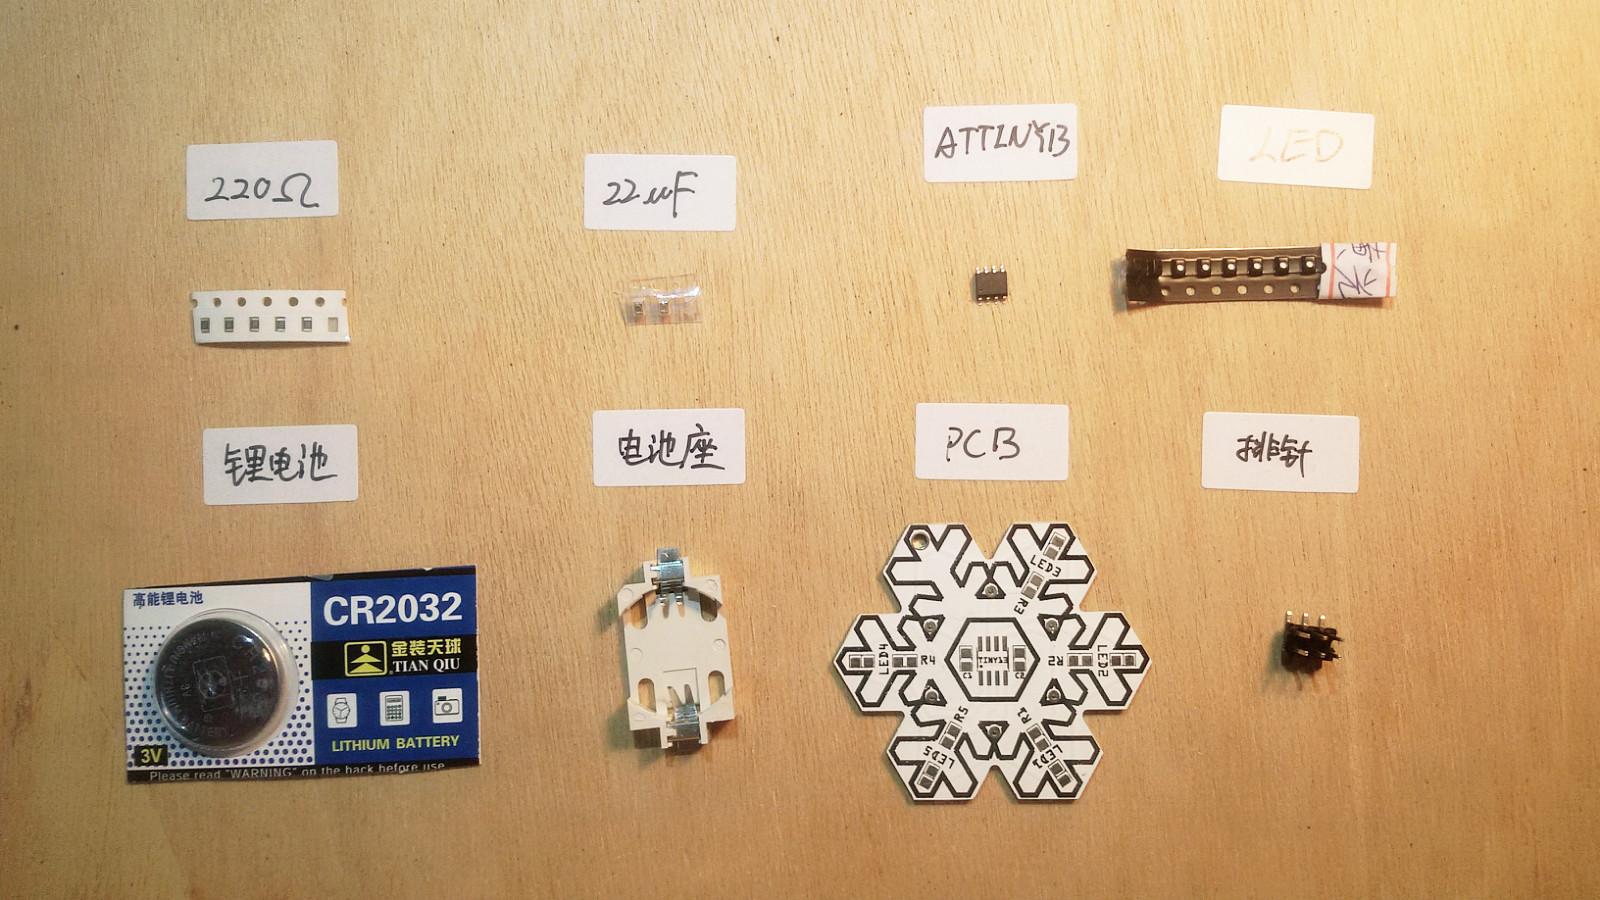 0101_Overview_meitu_1.jpg